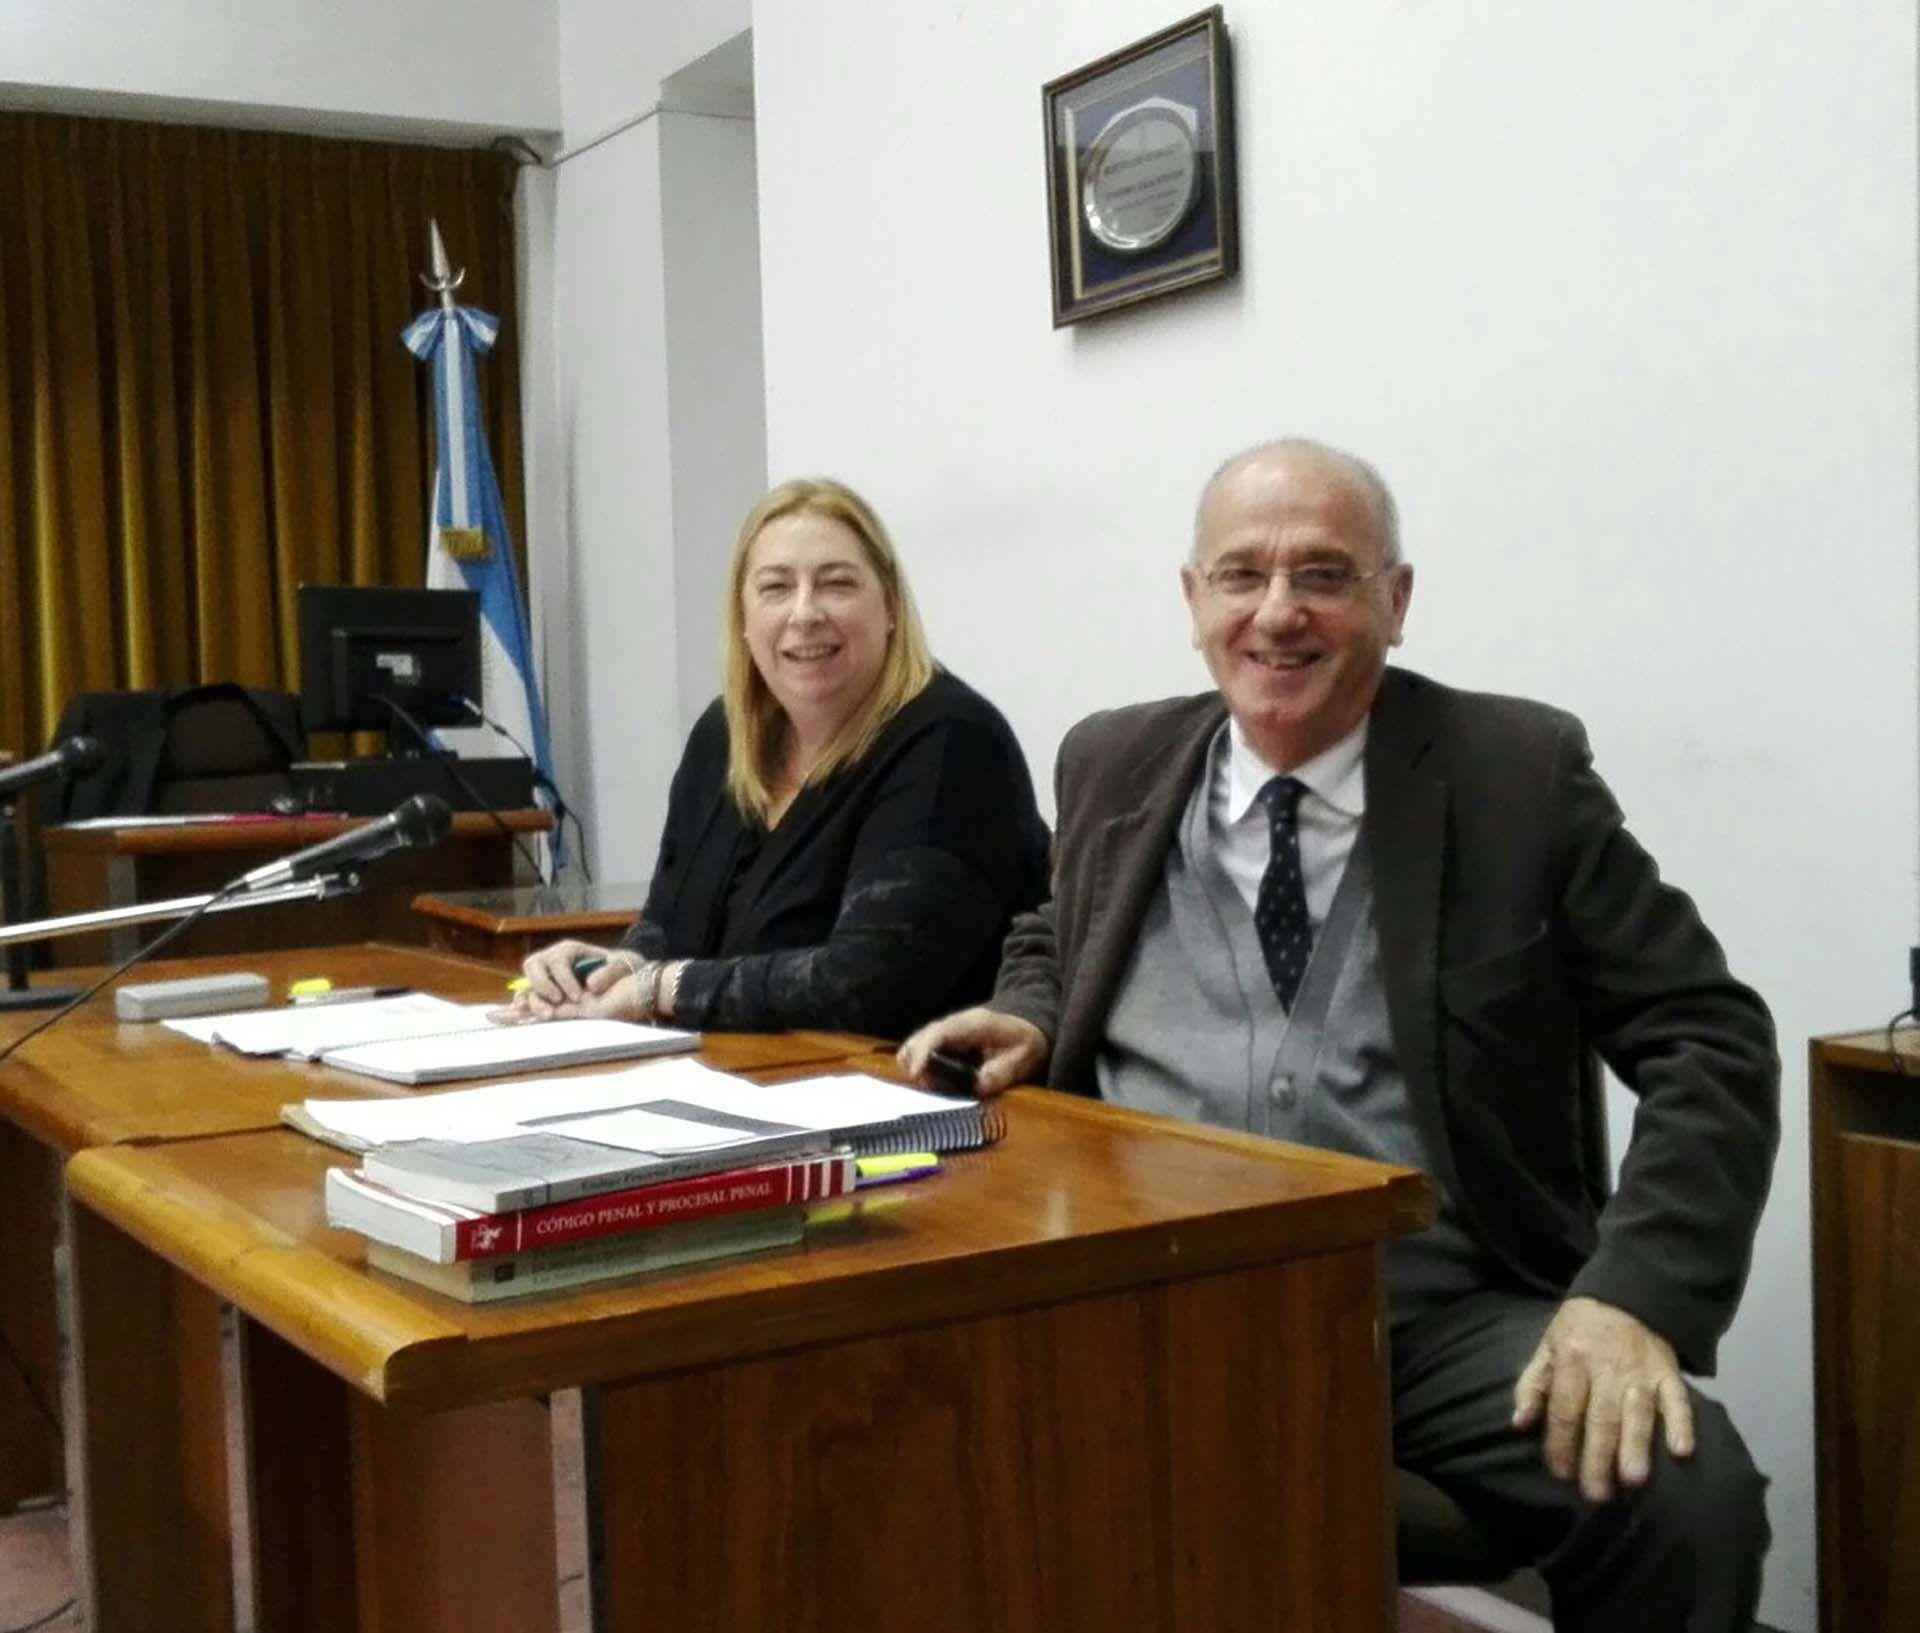 La fiscal de Violencia de Género de San Isidro, Laura Zyseskind